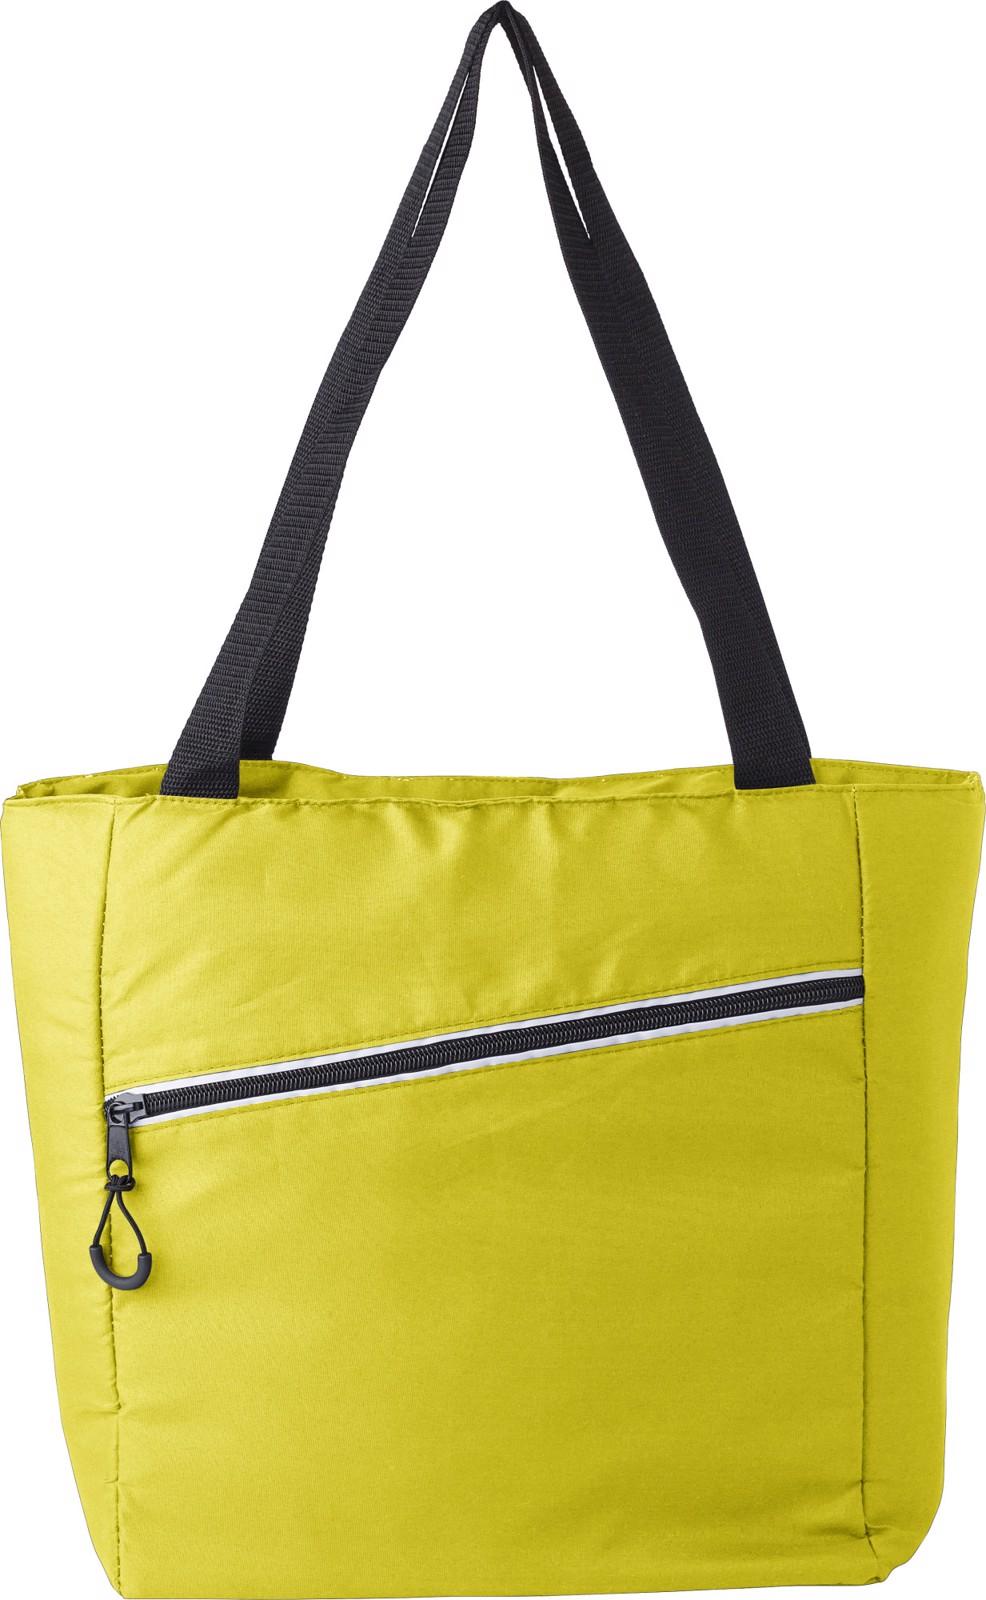 Pongee (75D) cooler bag - Yellow